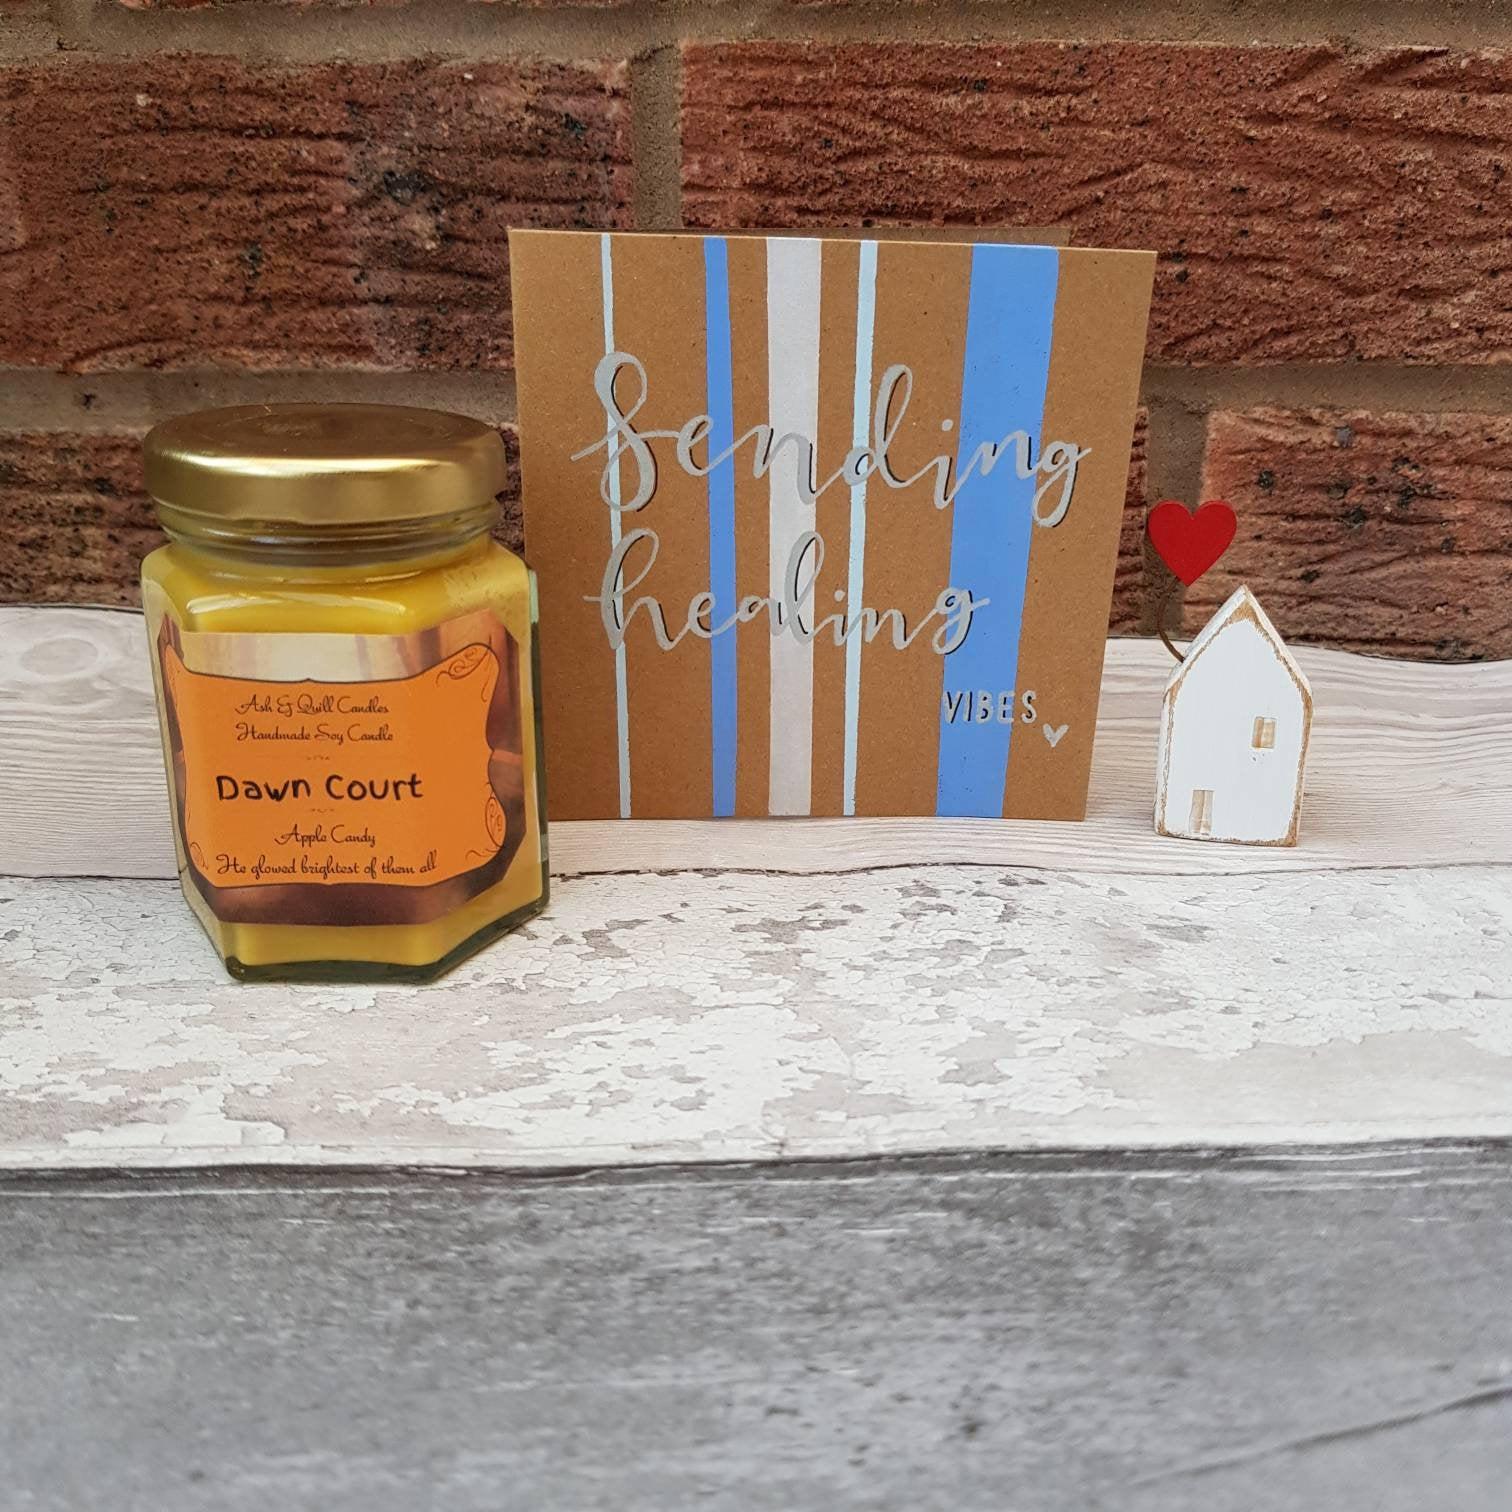 Sending Healing Vibes Card, Blank Card, Friendship, Motivation, Support – Handmade Kind Shop 3